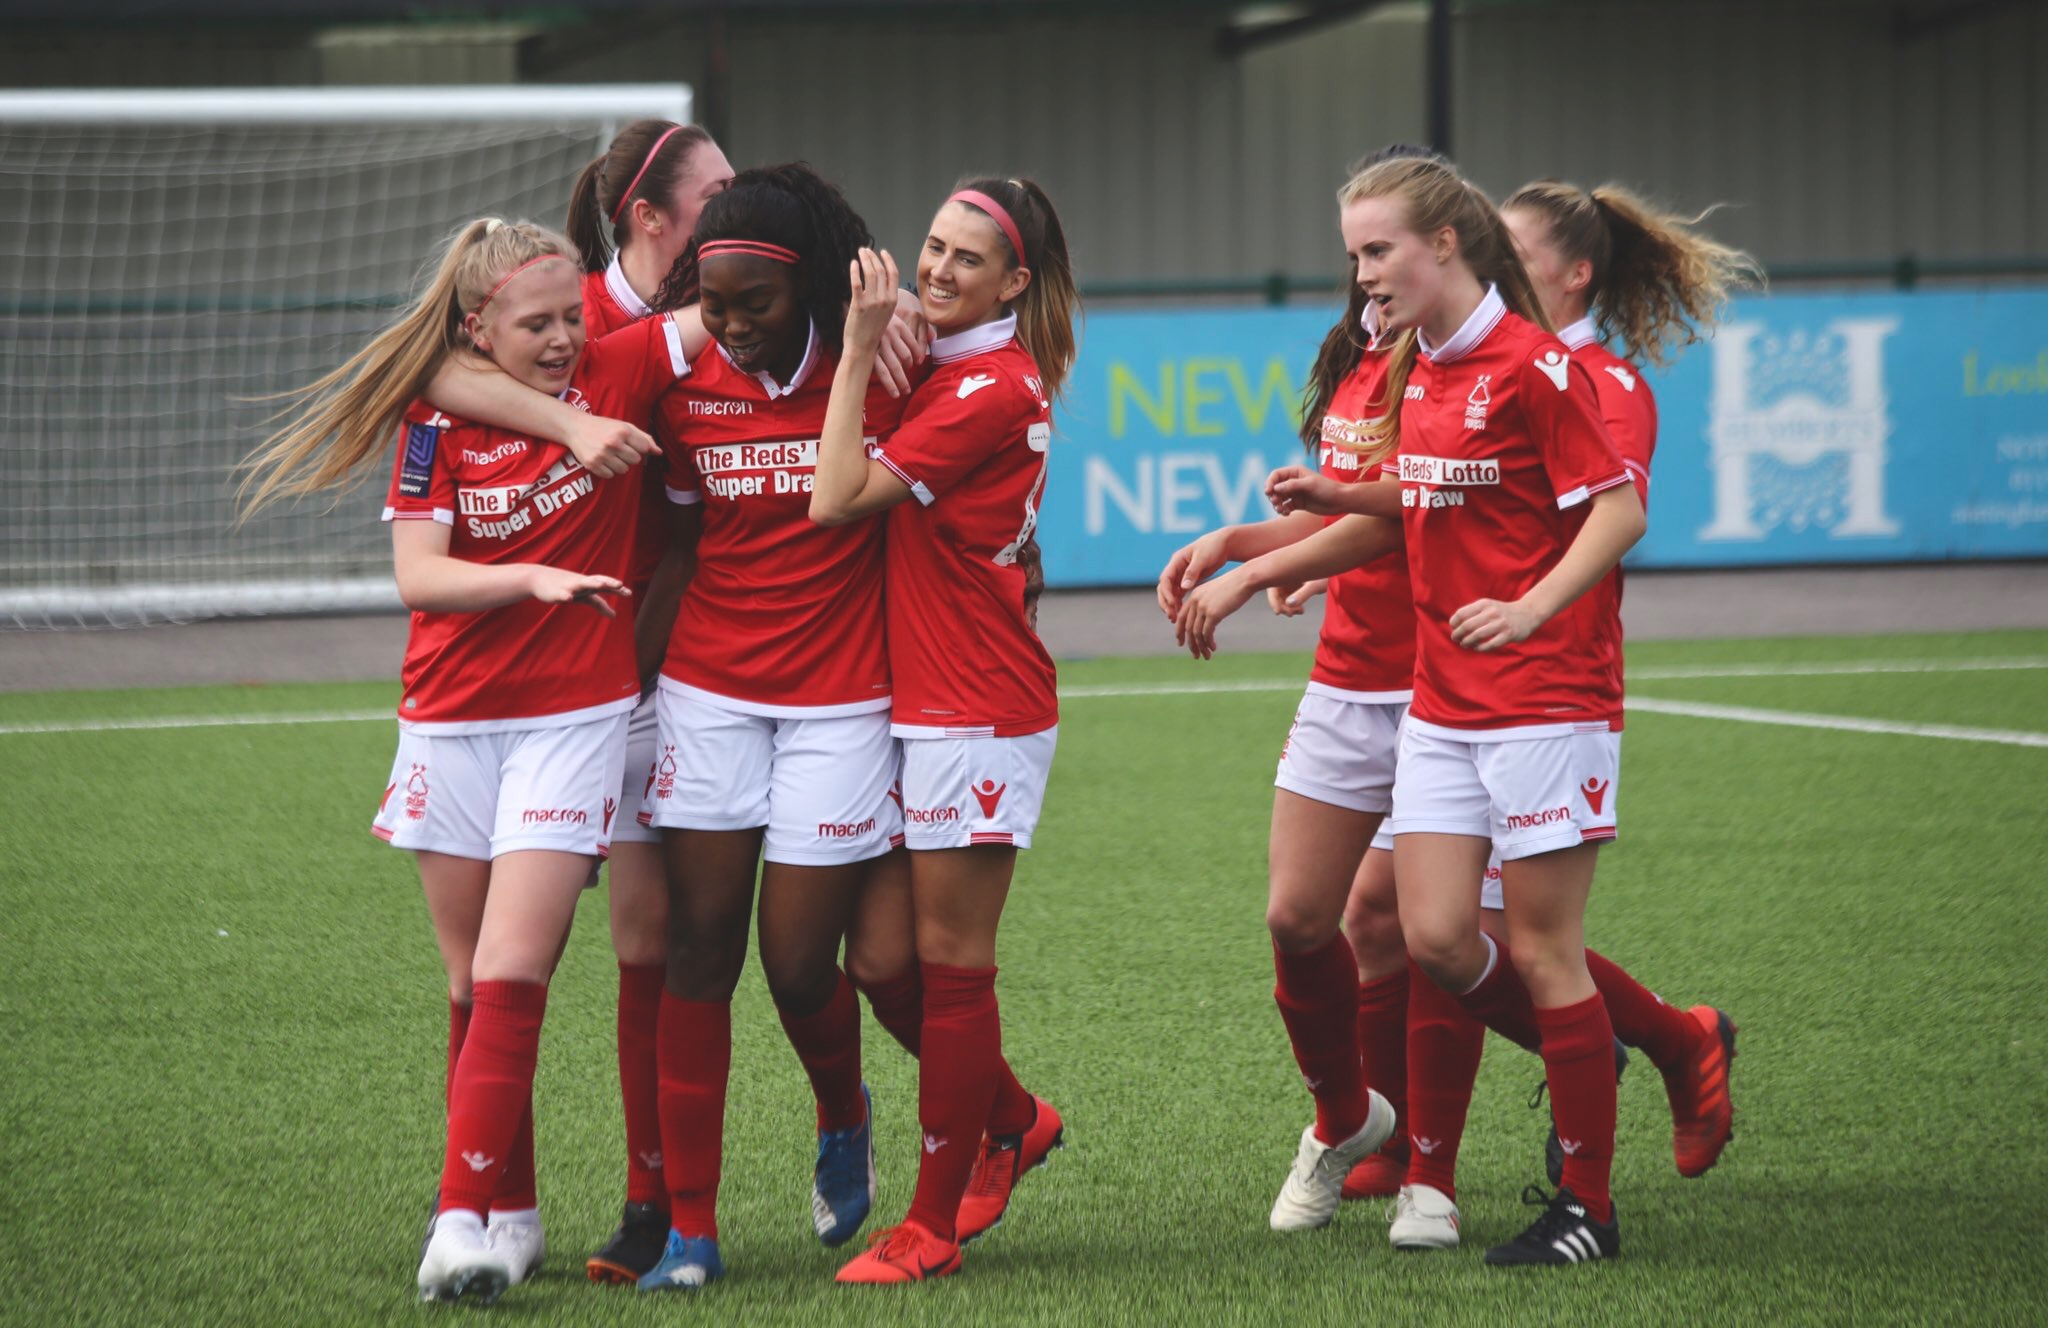 Precious Hamilton and her Forest team mates celebrate